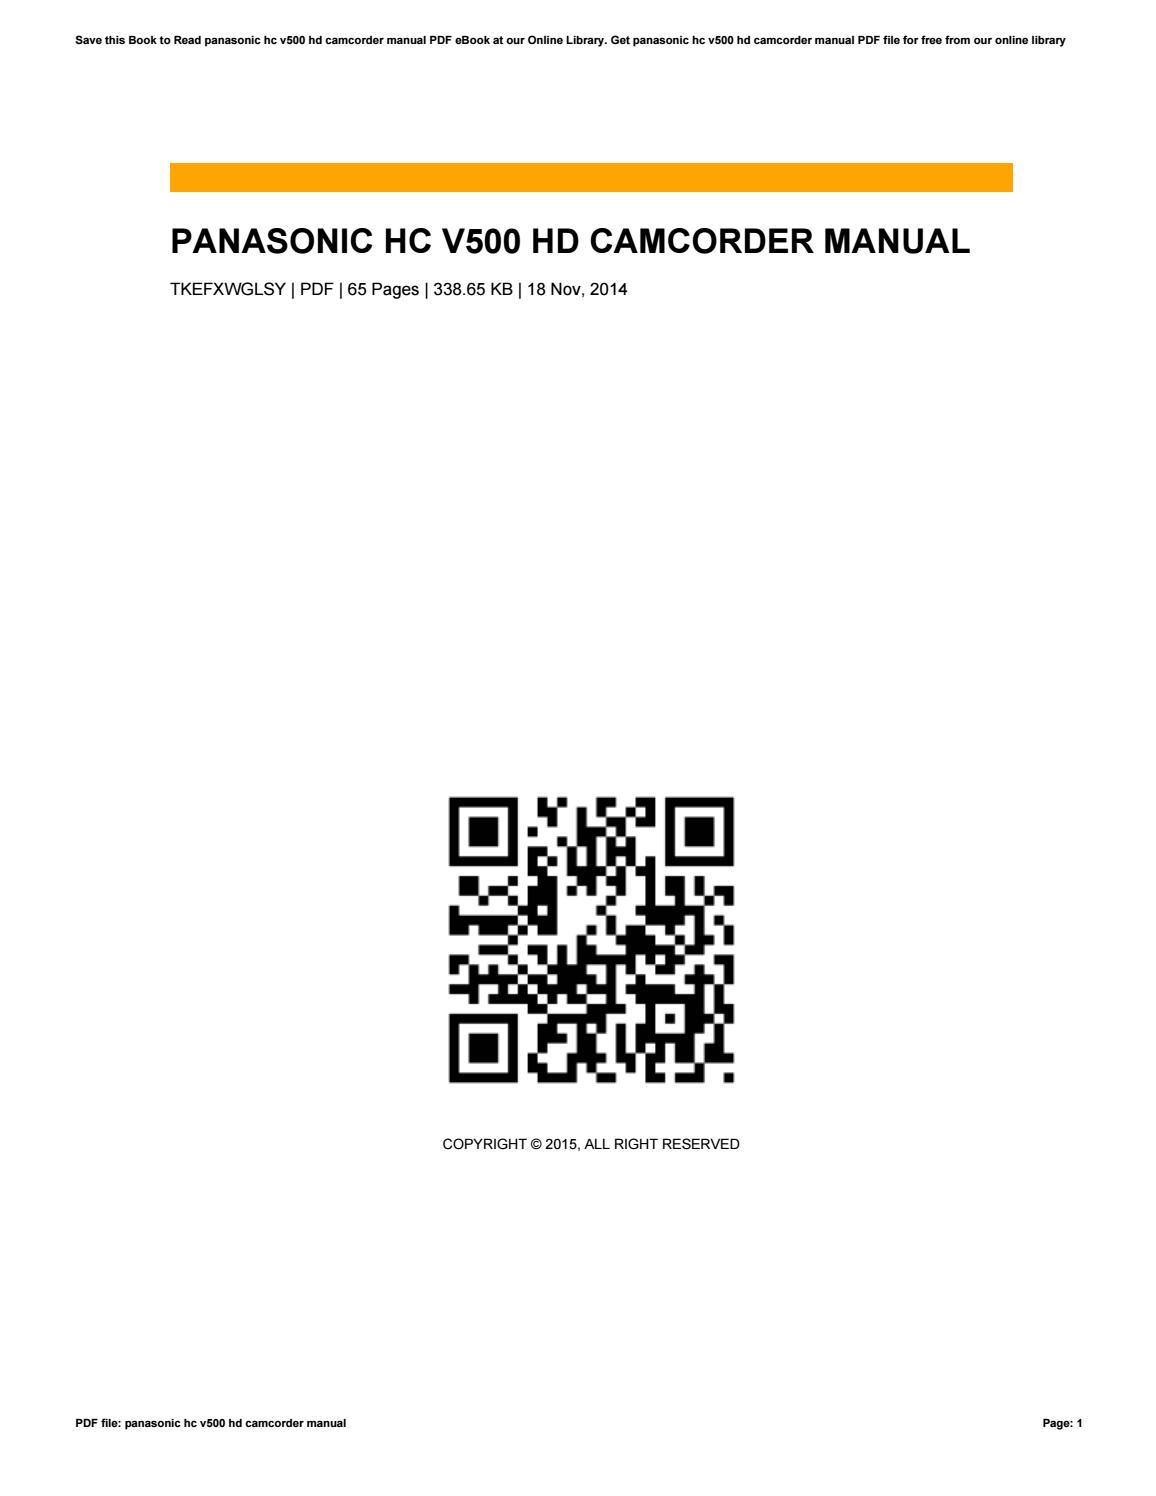 panasonic hc v500 hd camcorder manual by bridget blaine issuu rh issuu com